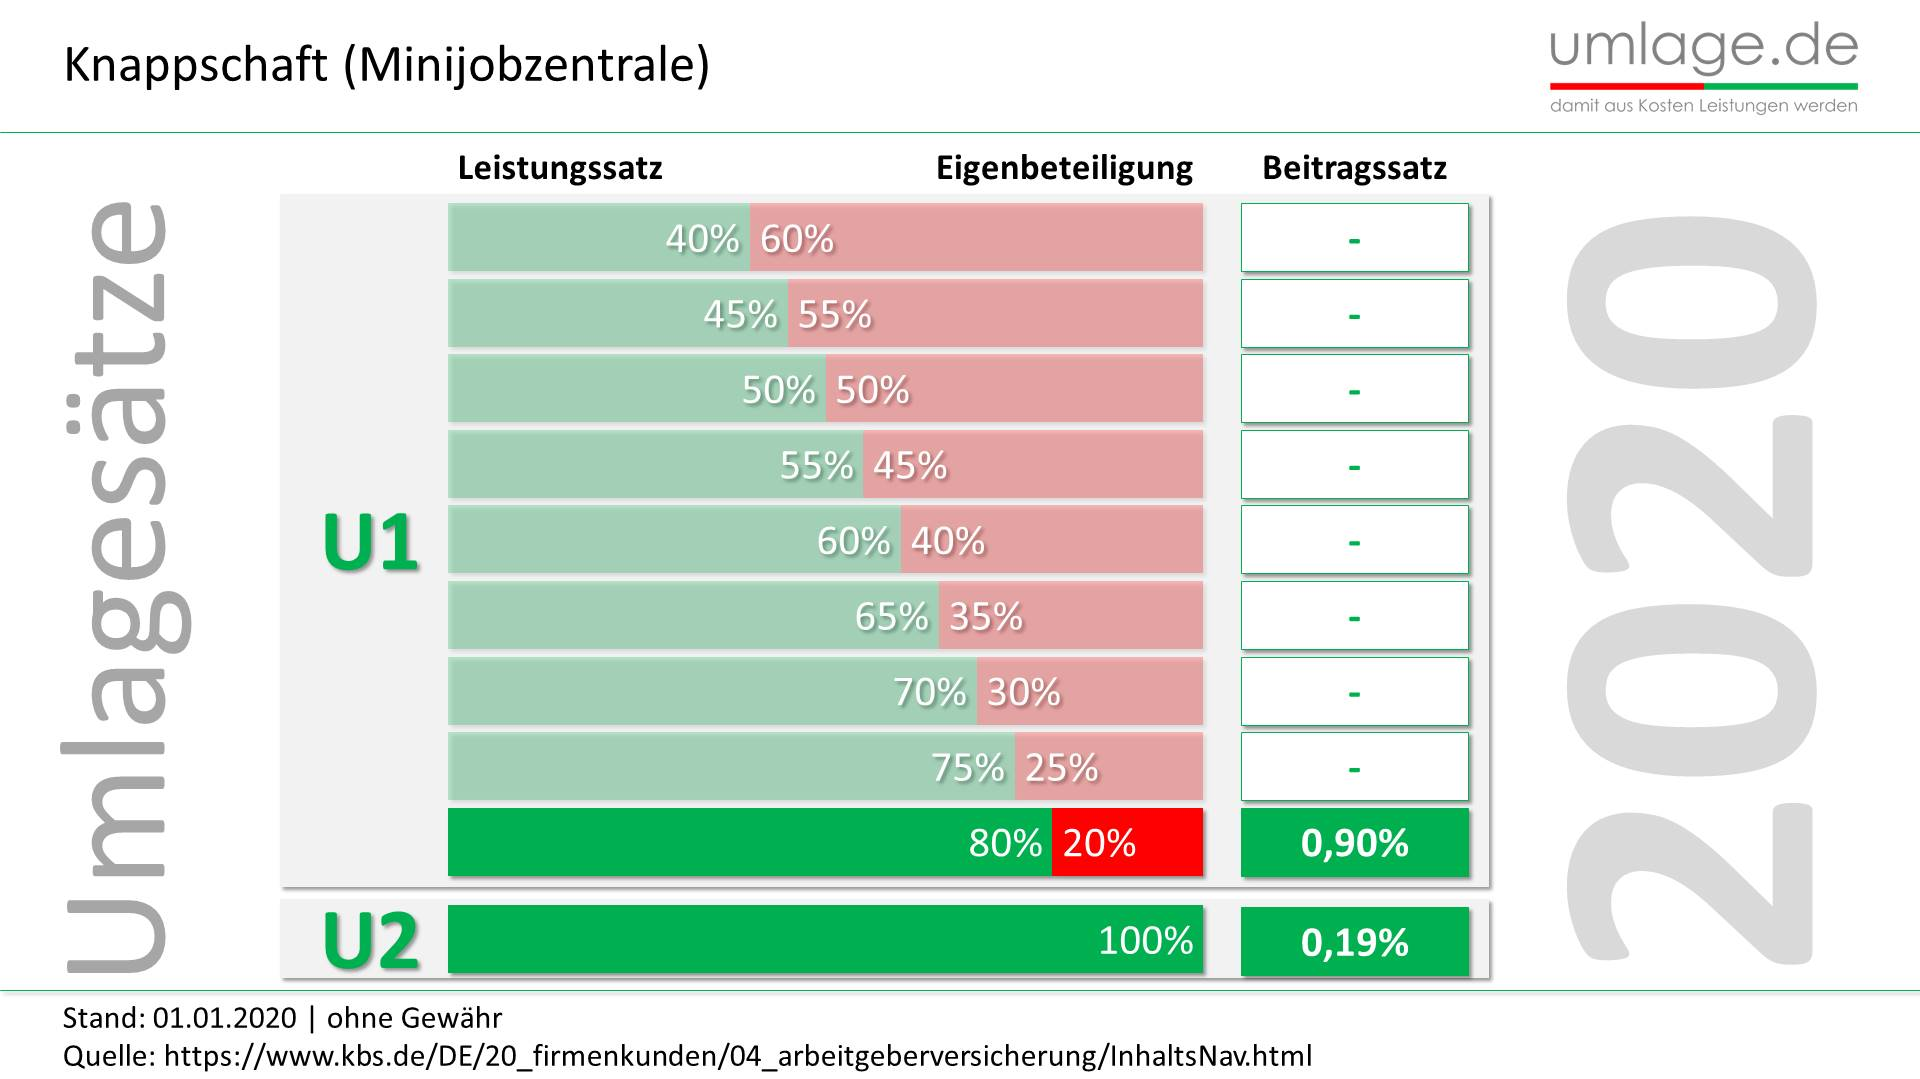 knappschaft minijobzentrale Umlagesätze 2020 aktuell